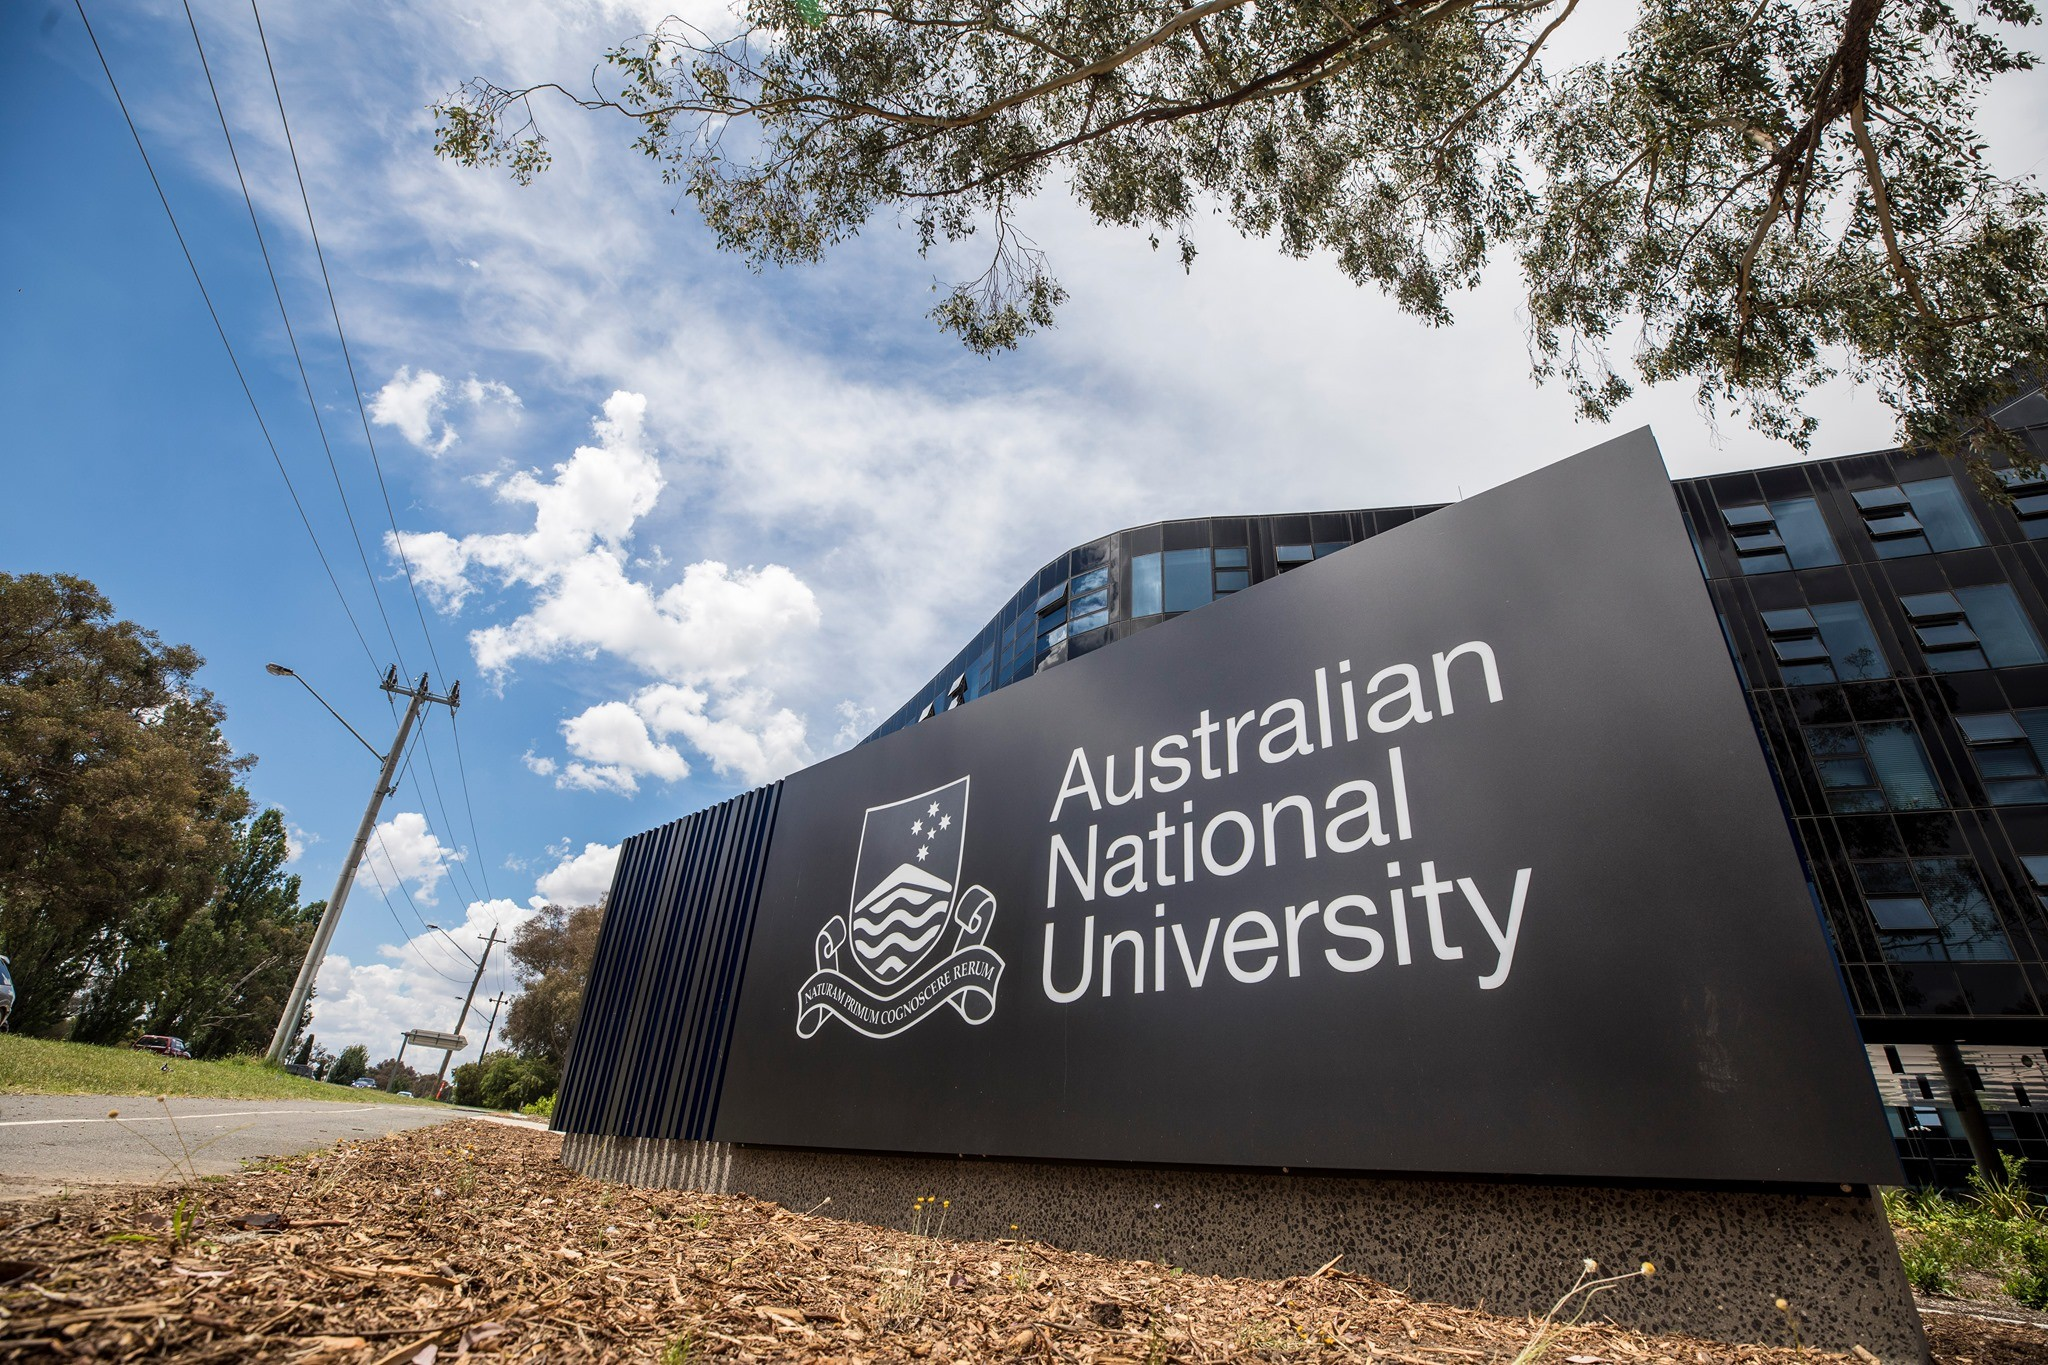 Australian National University (ANU)